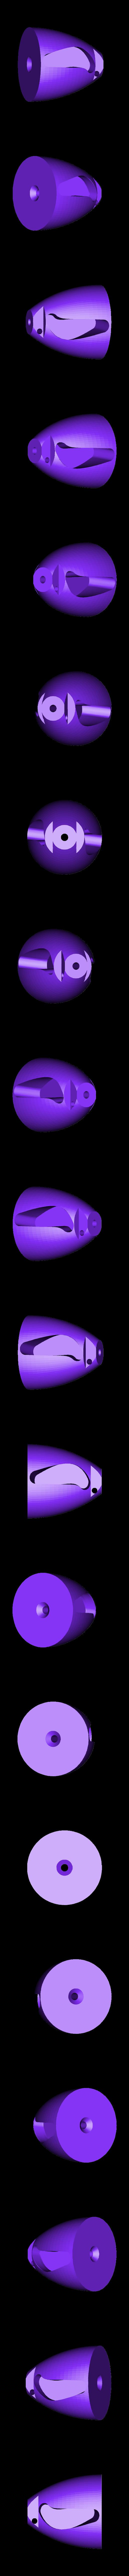 Spinner Hub 1.7.stl Download free STL file Flyer Mk. 1a Modifications • Object to 3D print, billbo1958